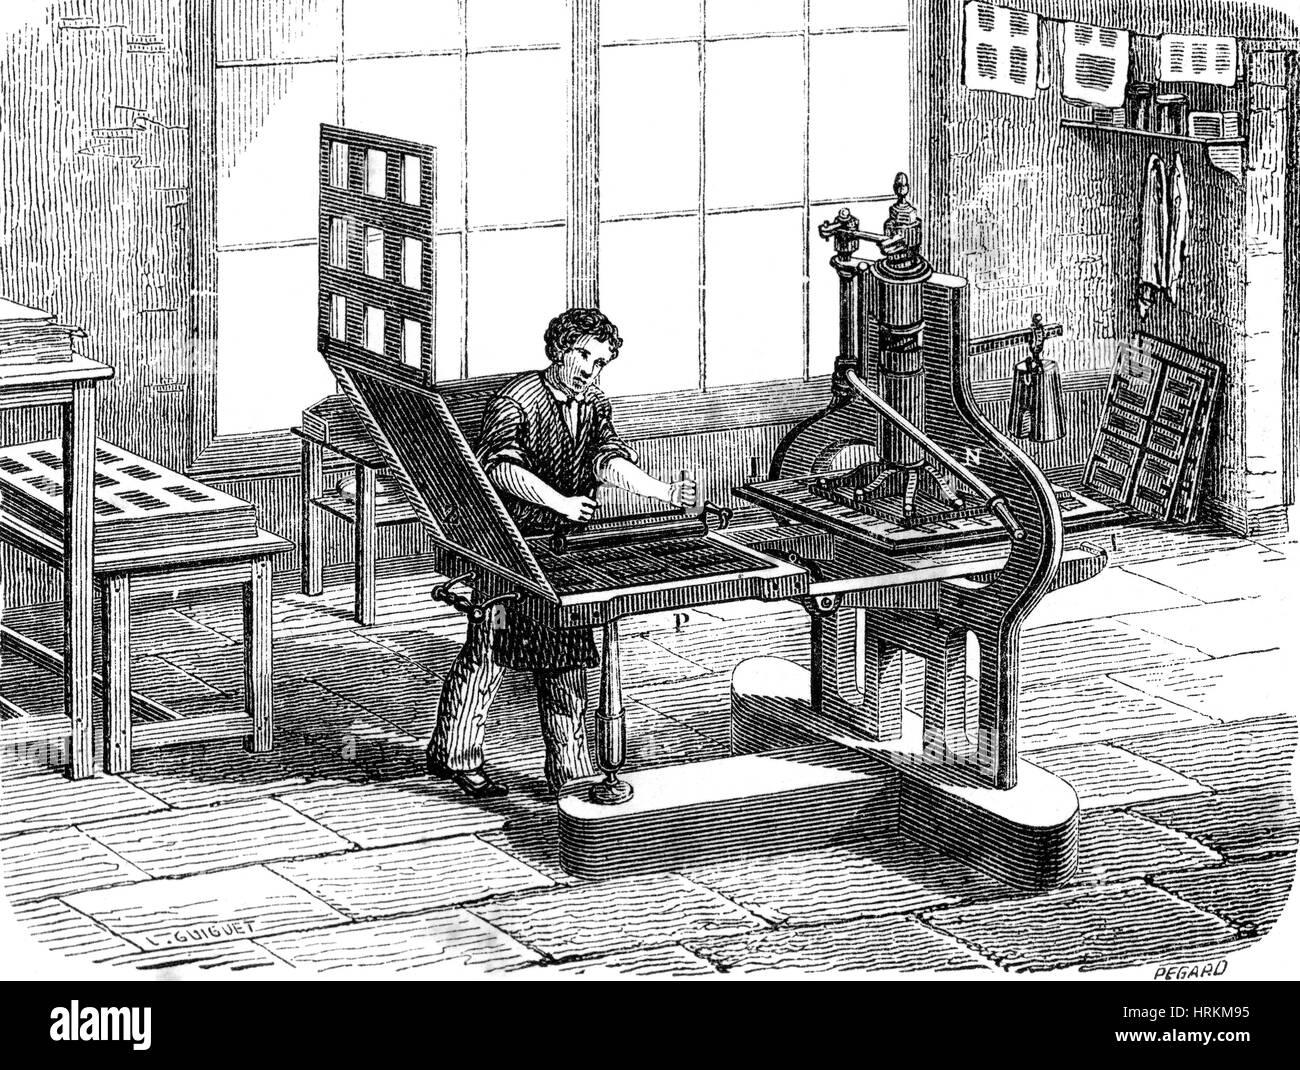 stanhope press first iron printing press 1806 stock photo